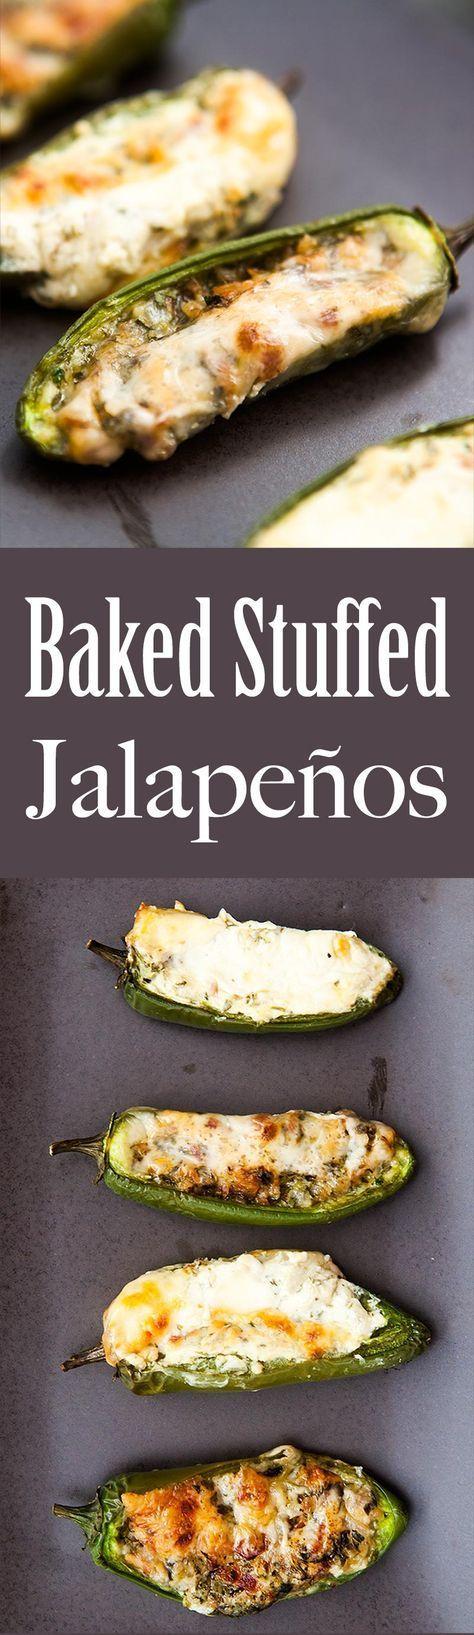 Baked Stuffed Jalapeños | Recipe | Baked Stuffed Jalapenos ...